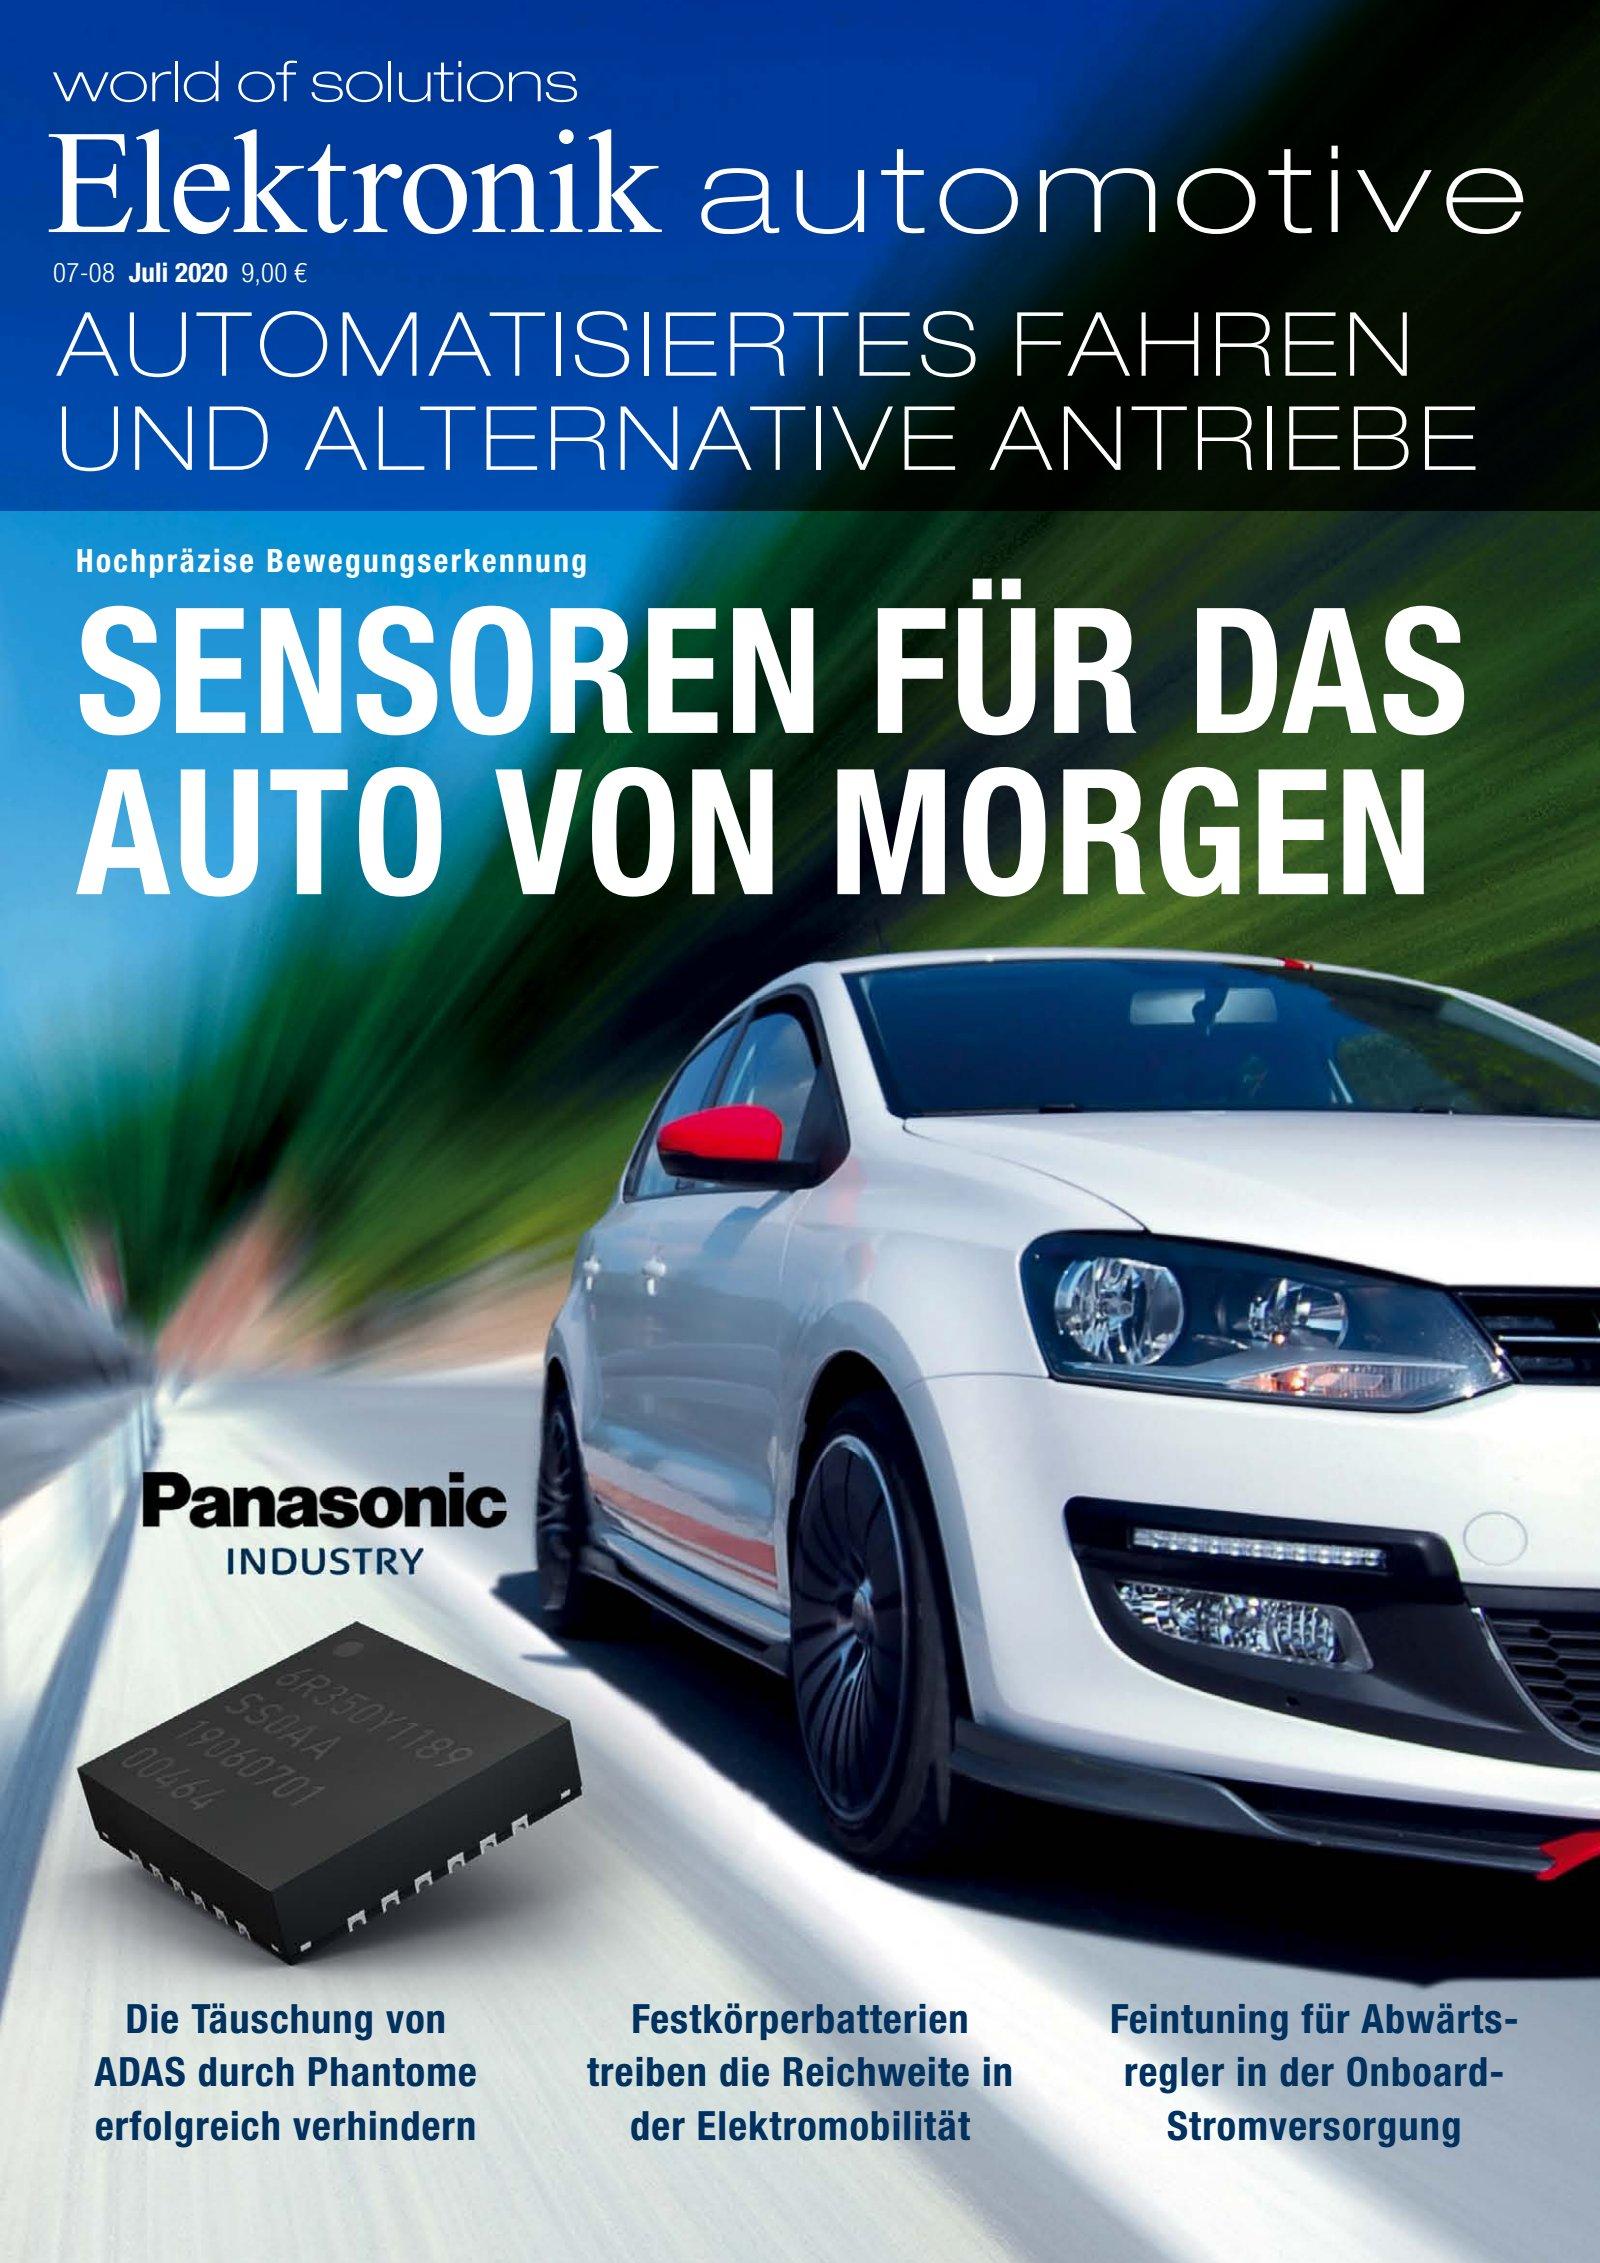 Elektronik automotive 07-08/2020 Digital